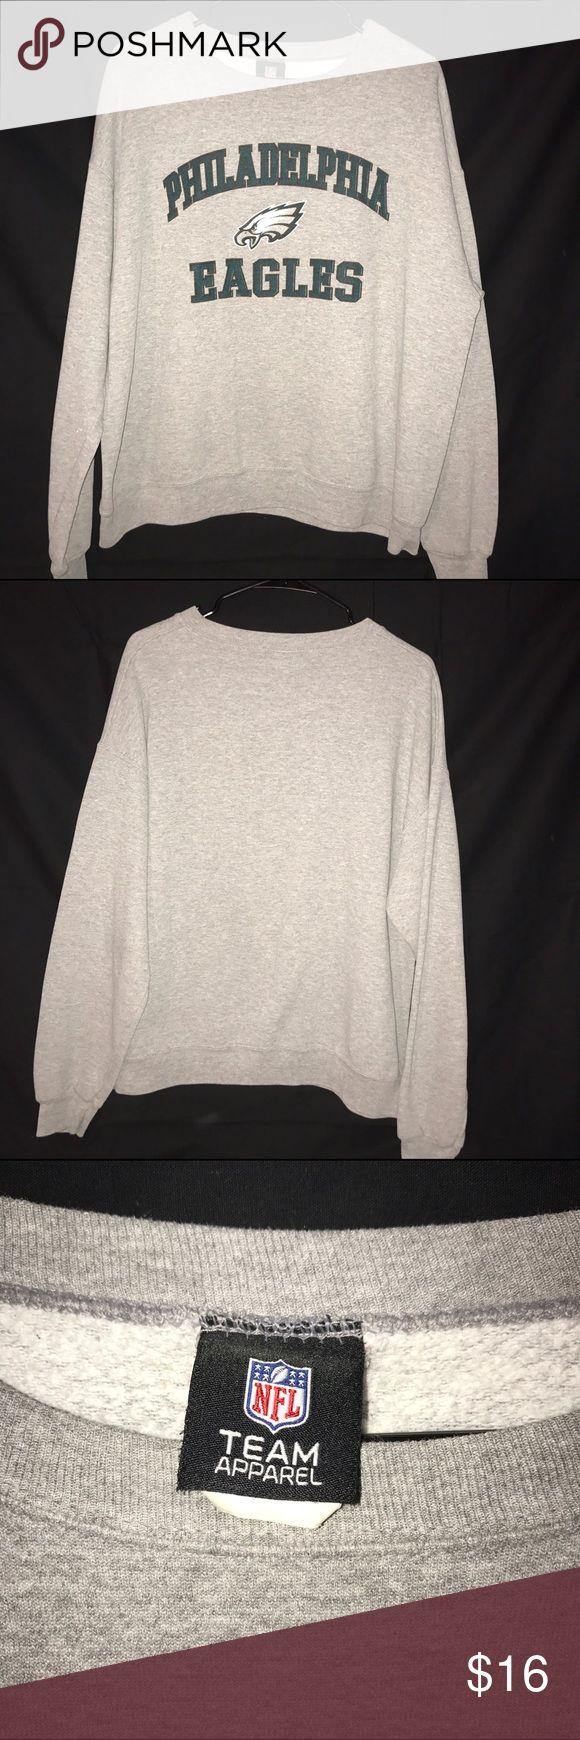 Philadelphia Eagles Sweatshirt Men's Philadelphia Eagles Sweatshirt. Size Large. Very nice condition, no issues. NFL Shirts Sweatshirts & Hoodies